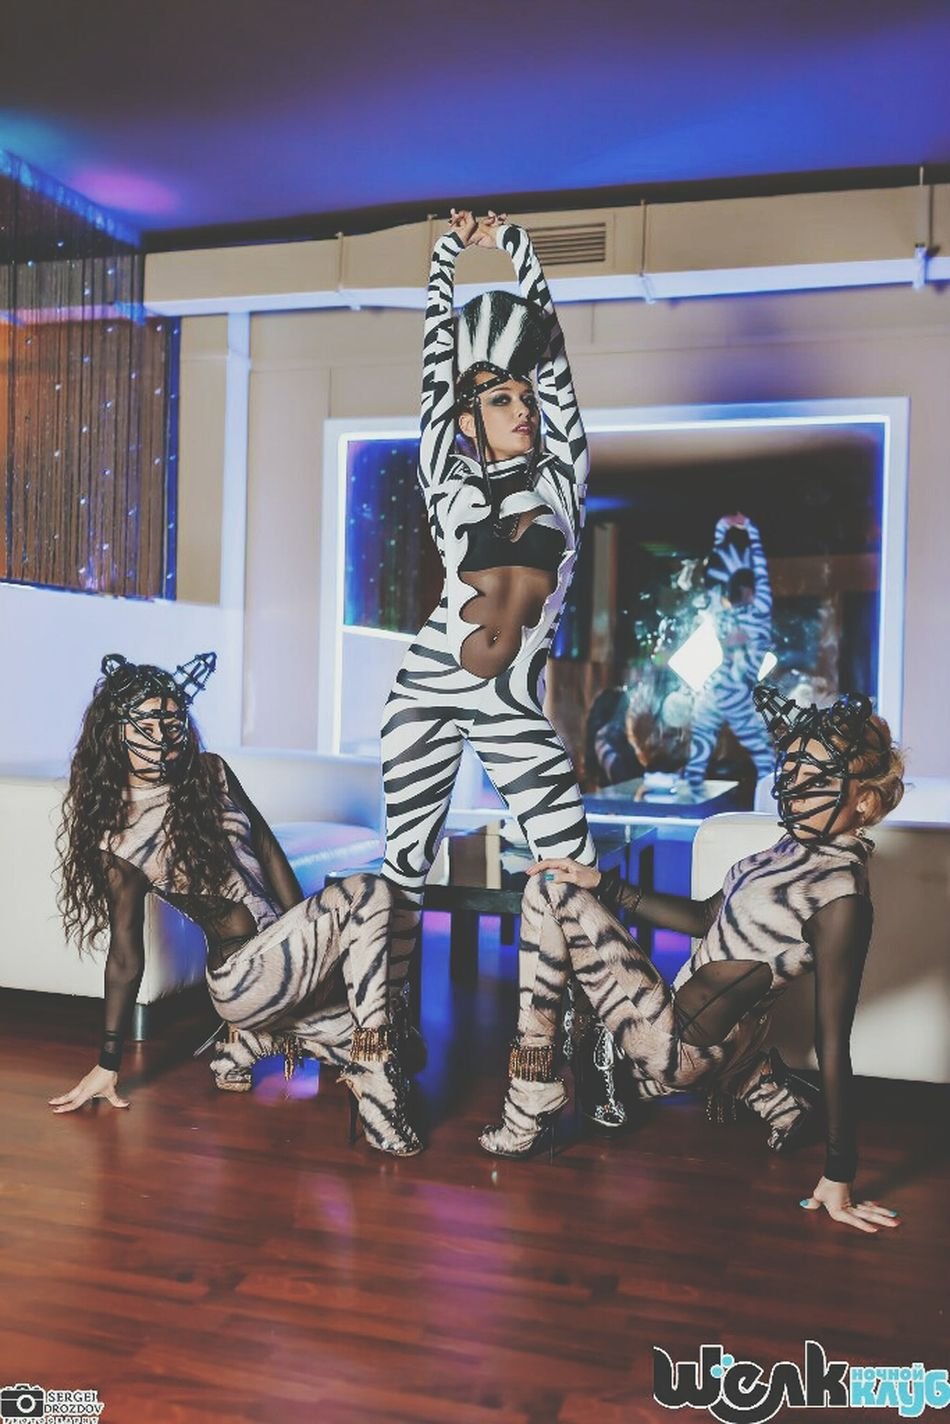 The ROX Dance Show